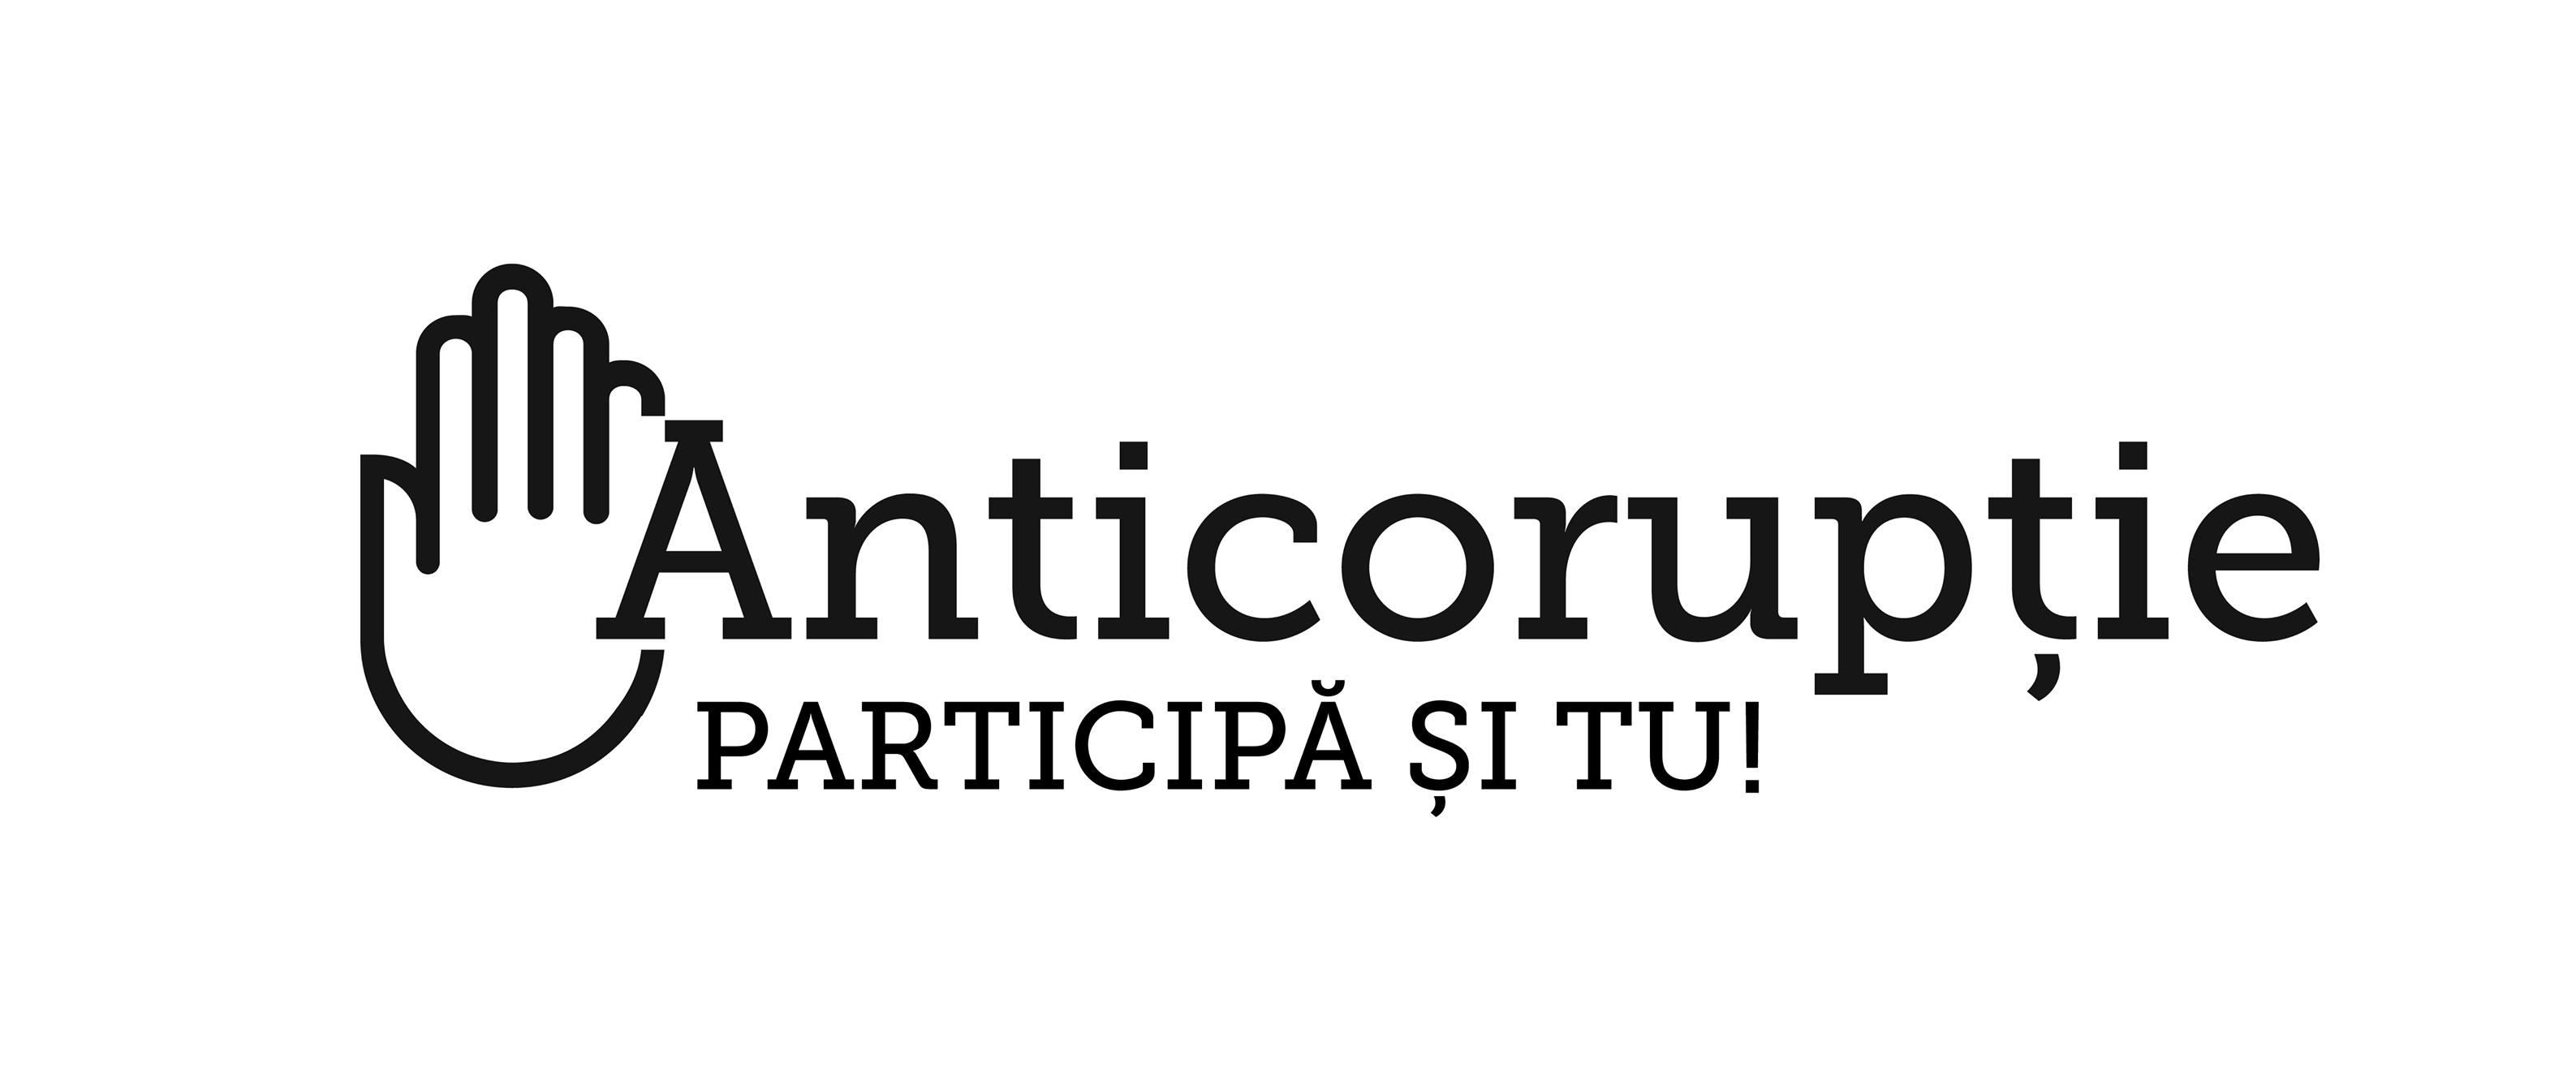 Anticoruptie.md